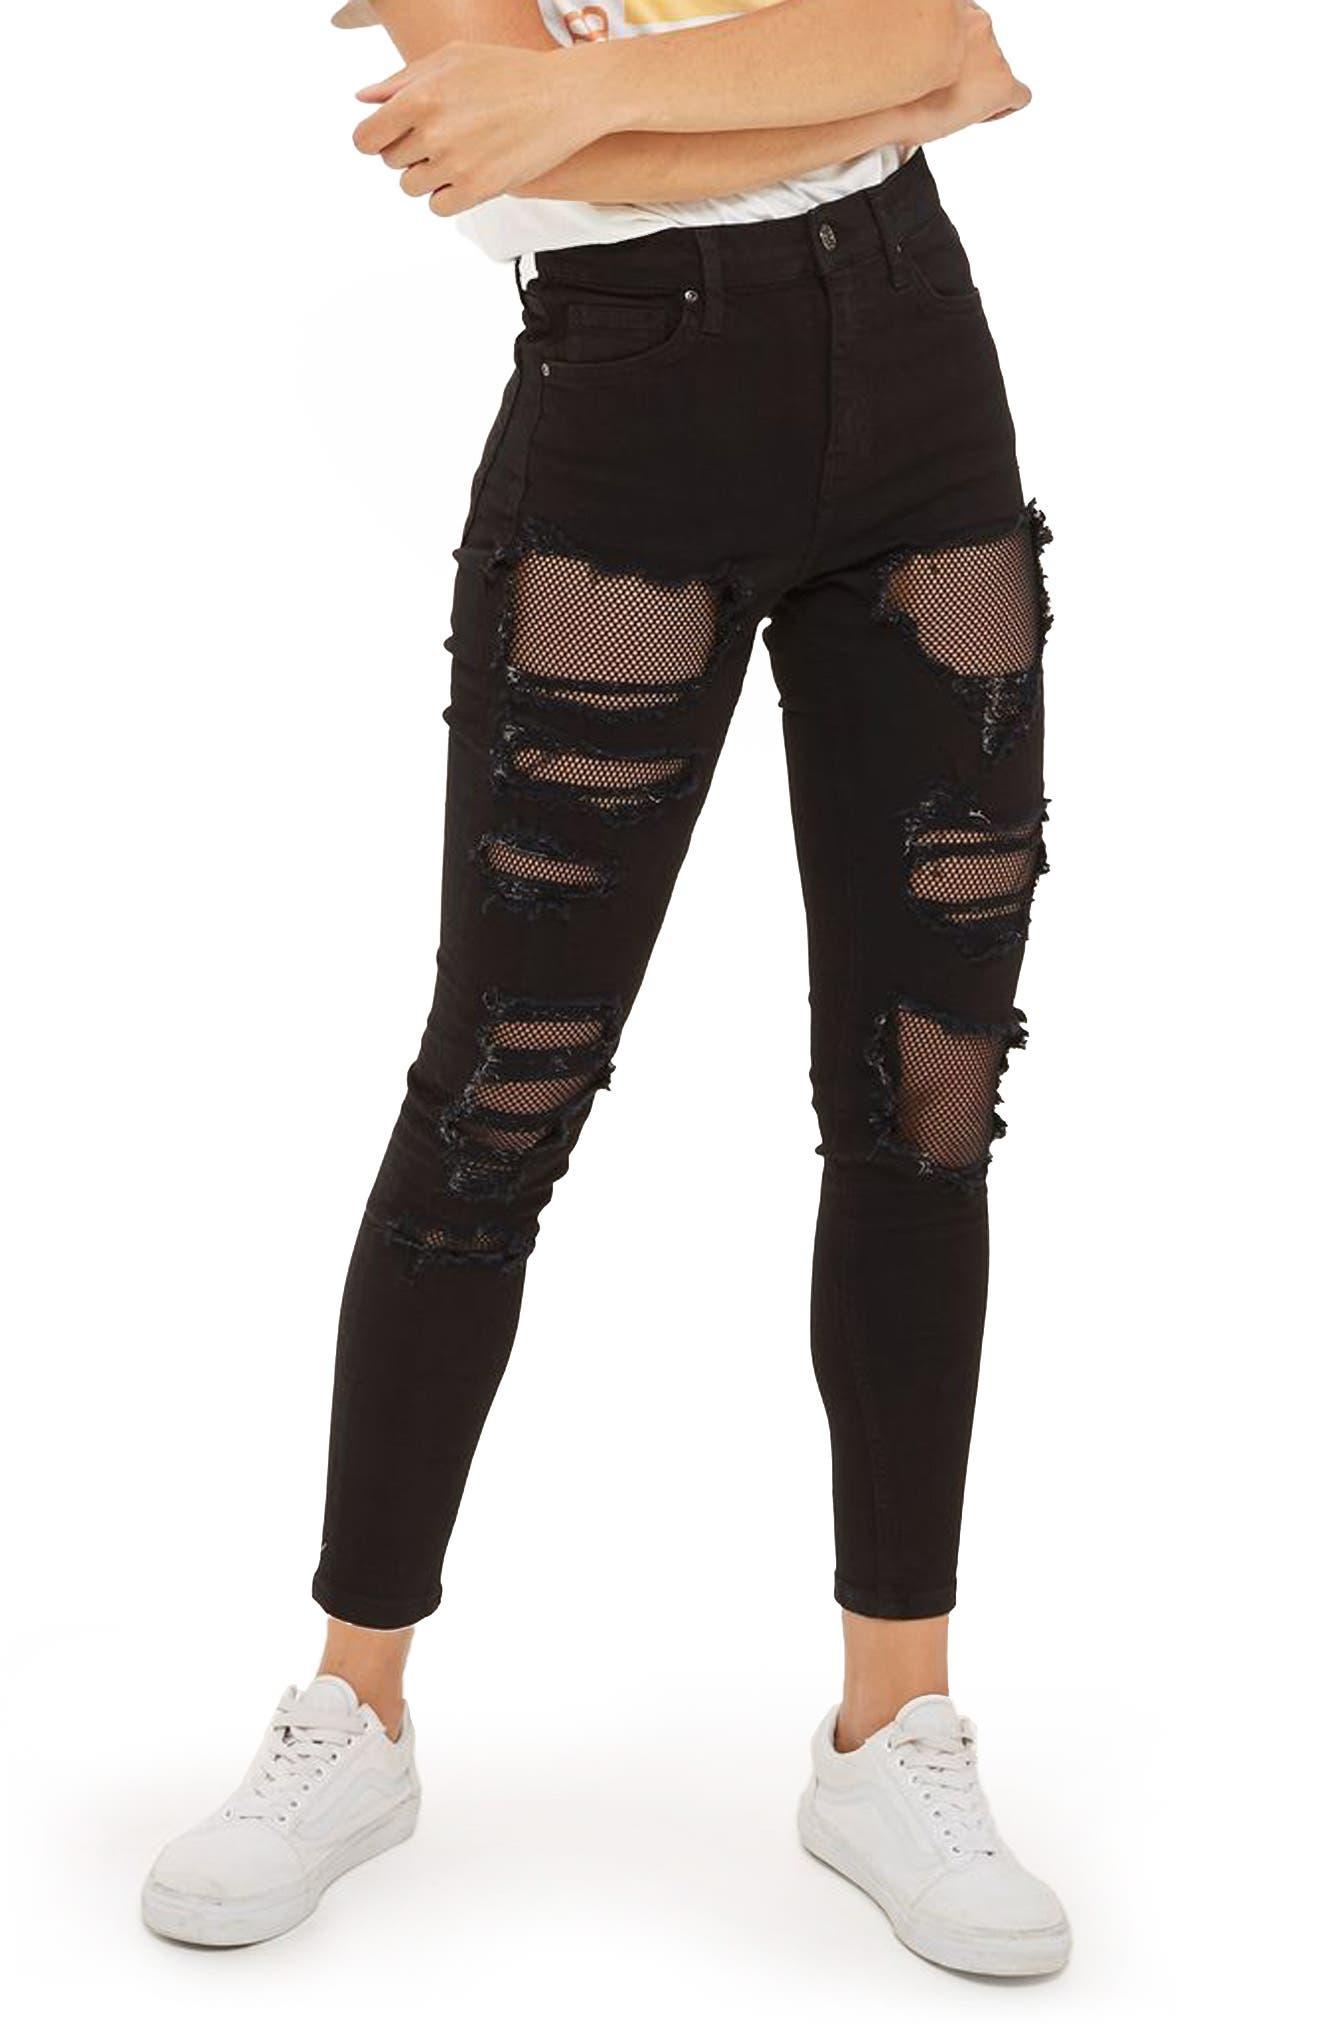 Jamie Black Fishnet Rip Skinny Jeans,                             Main thumbnail 1, color,                             001